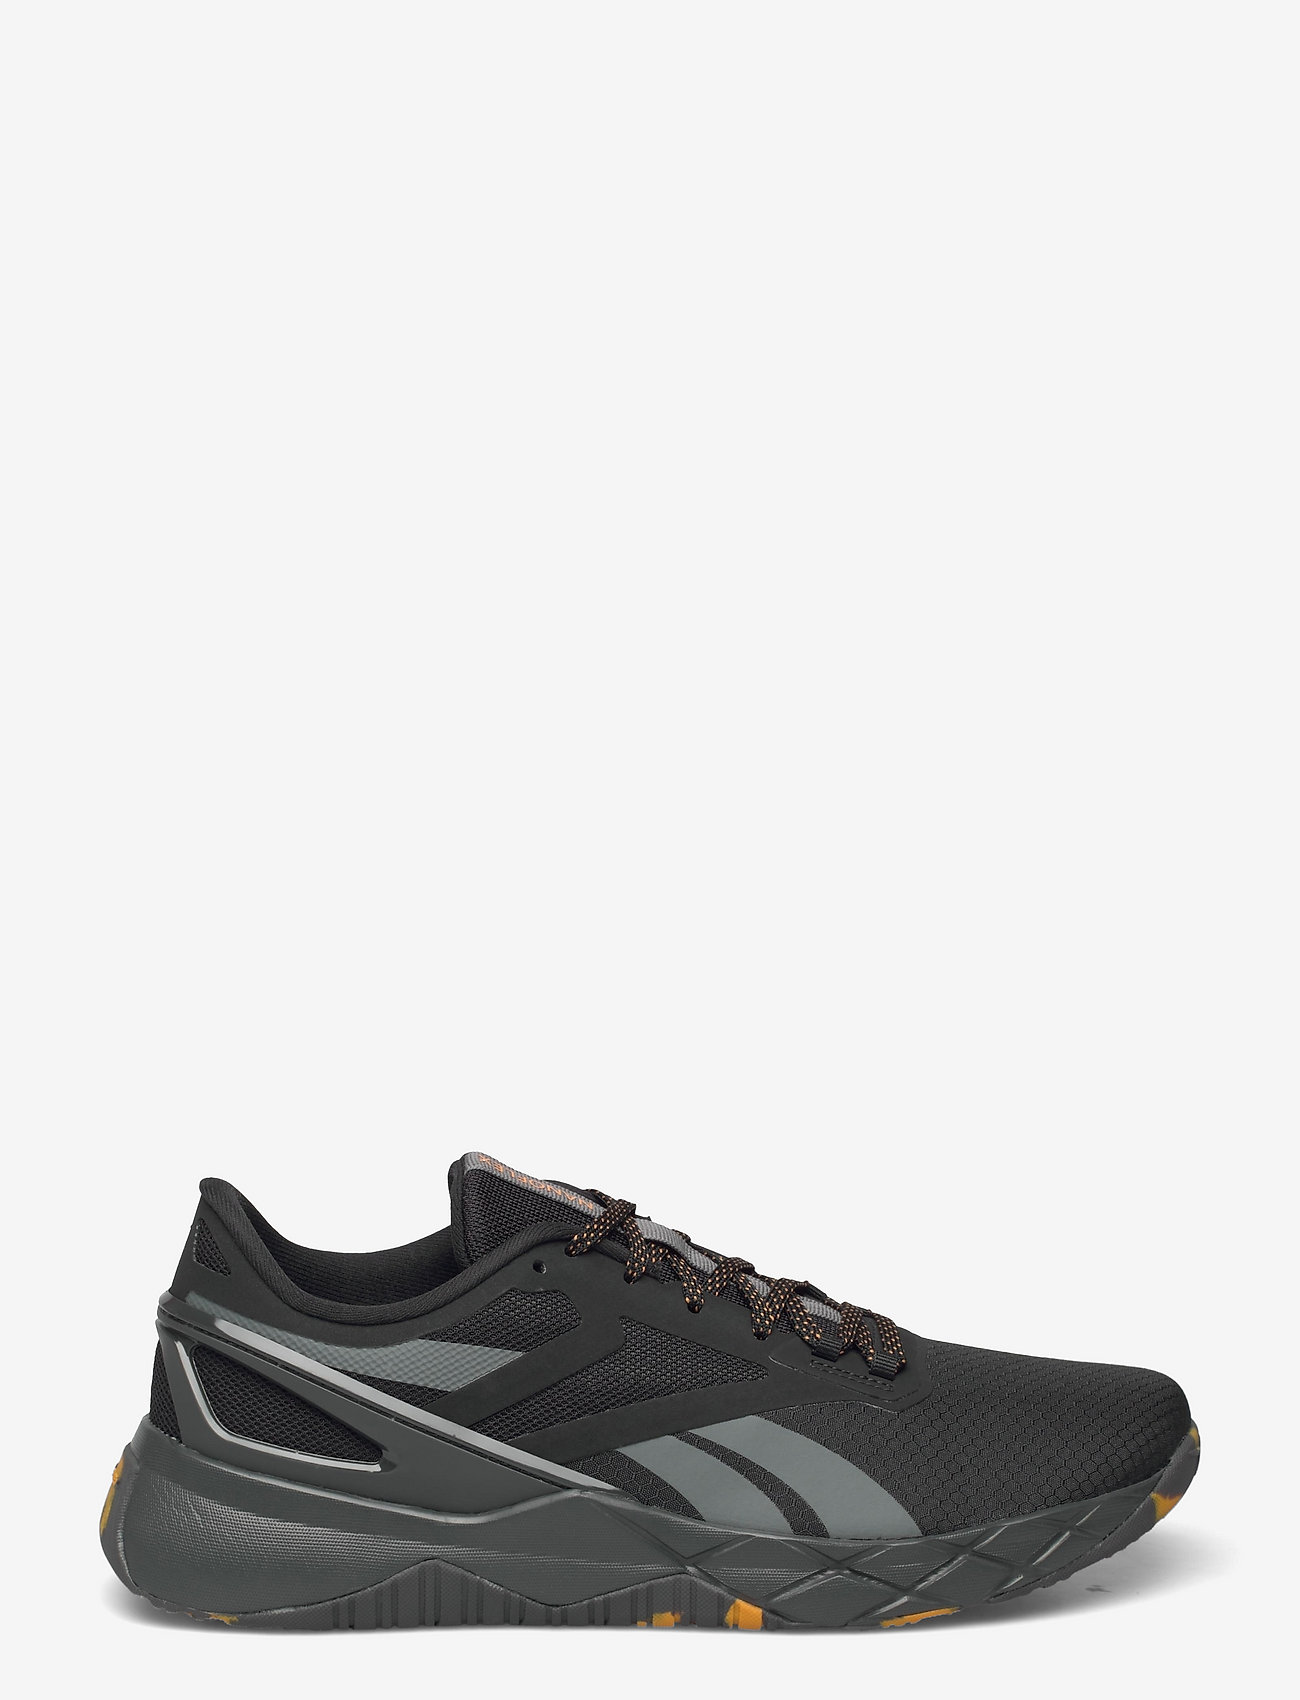 Reebok Performance - NANOFLEX TR - training schoenen - cblack/cdgry6/cdgry7 - 1